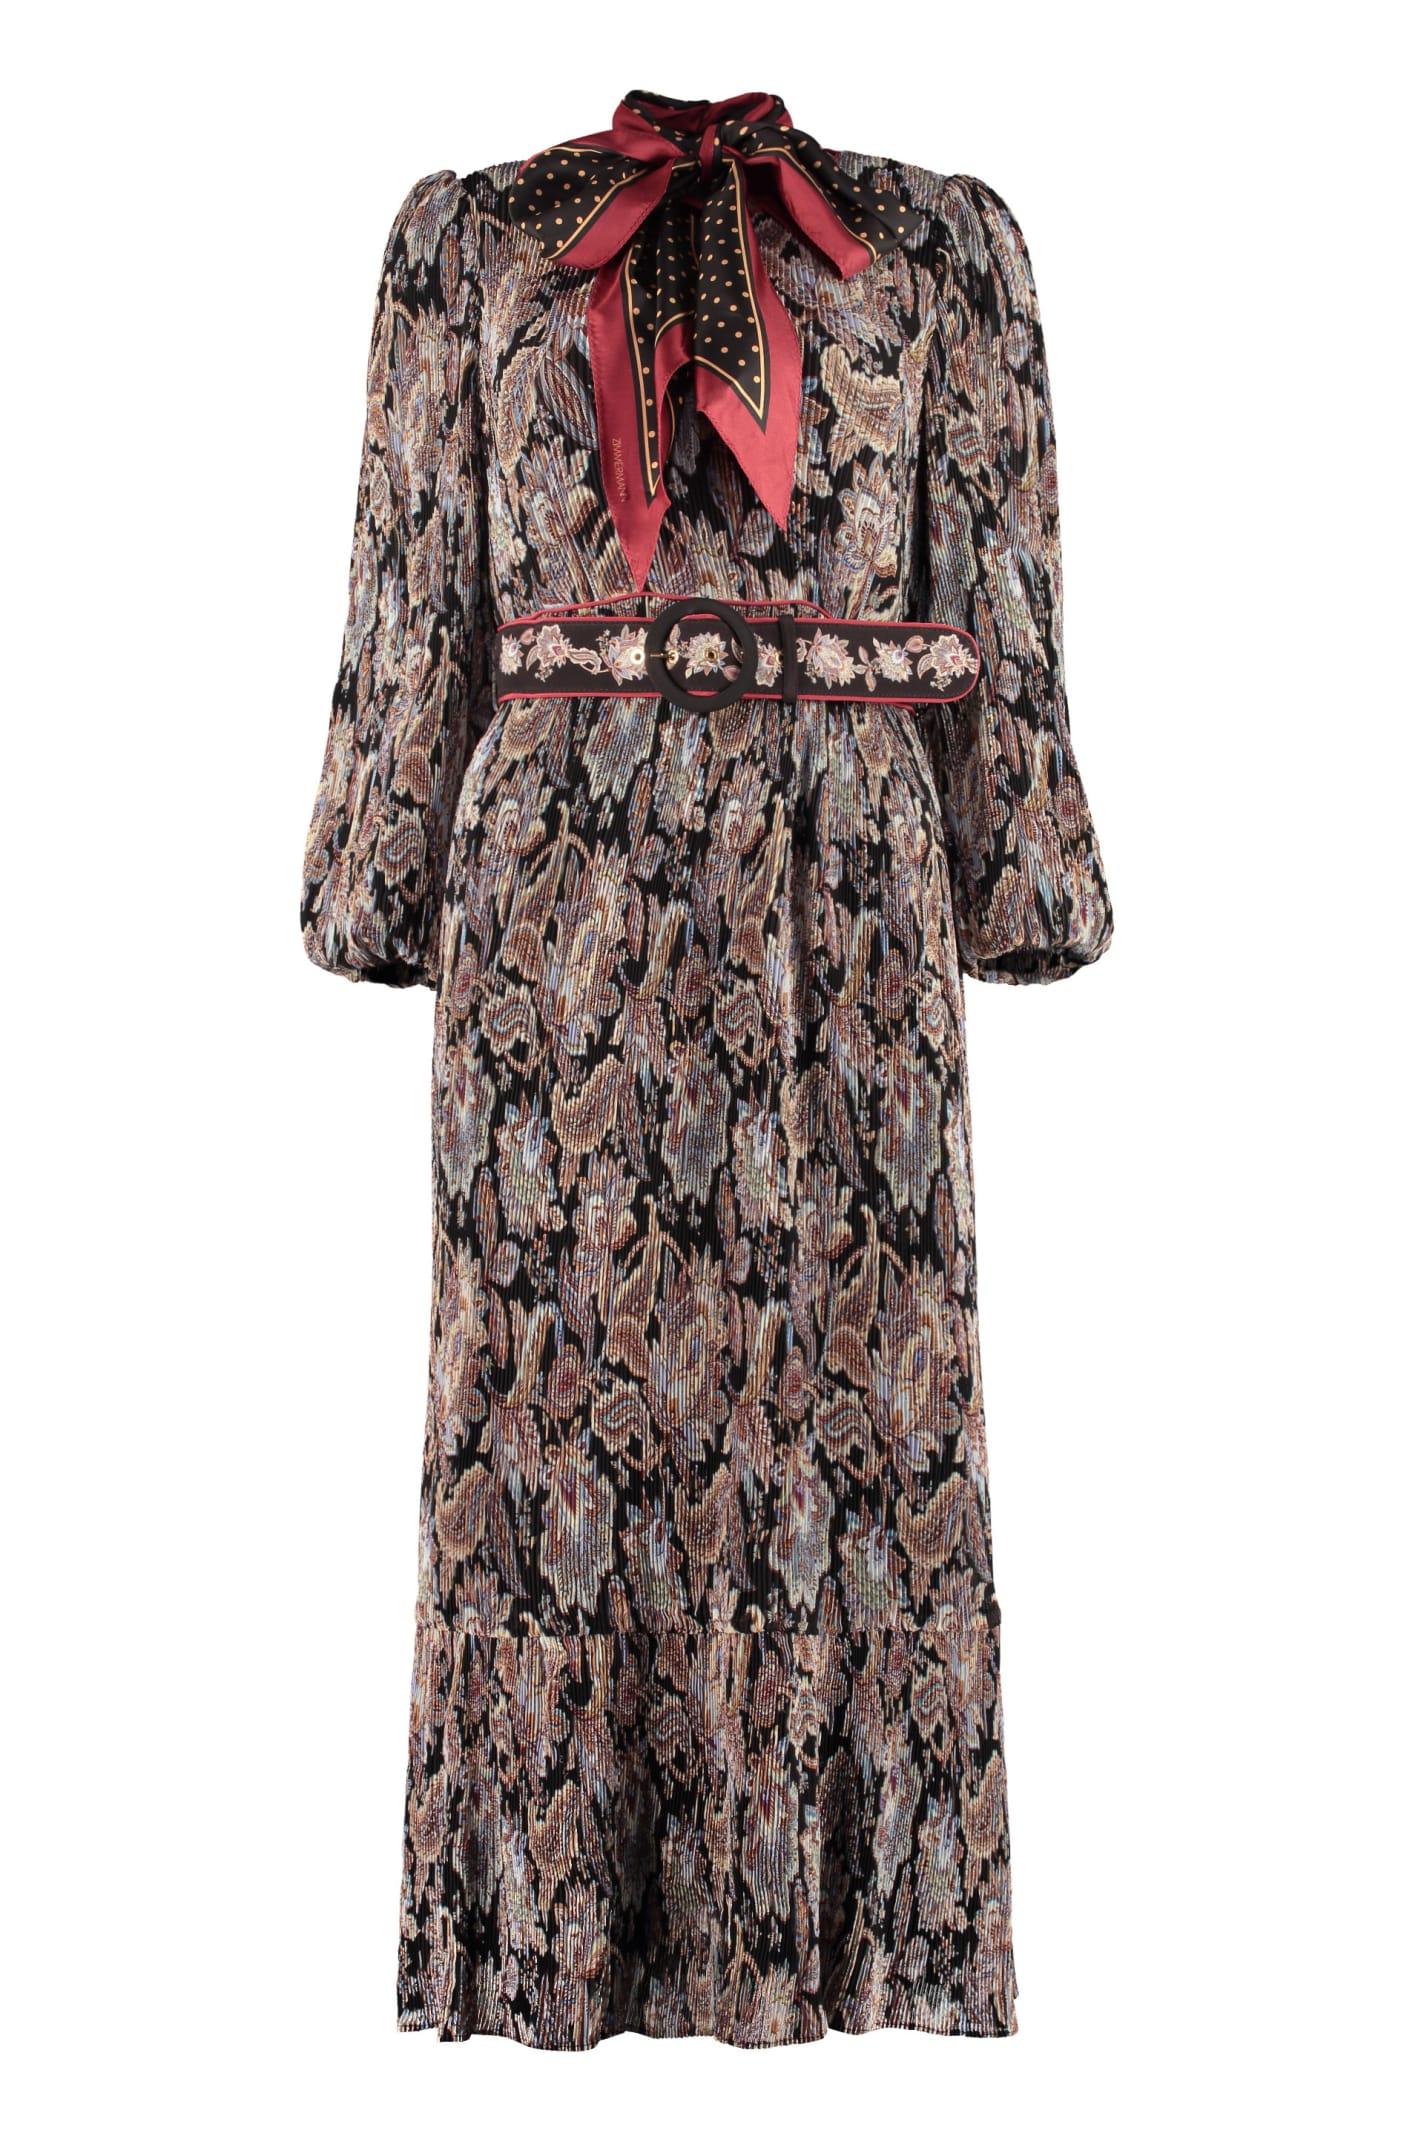 Zimmermann Belted Midi Dress